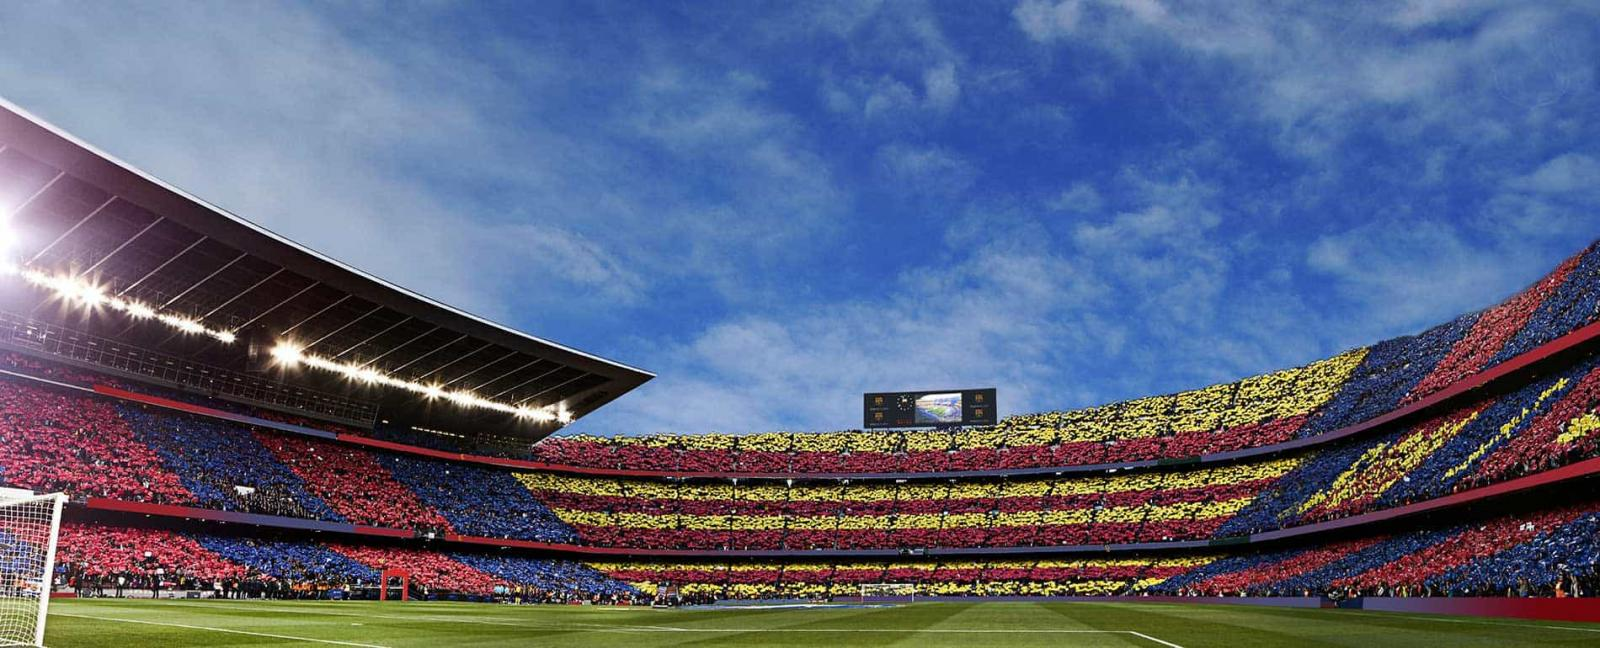 FC Barcelona - Camp Nou Stadium